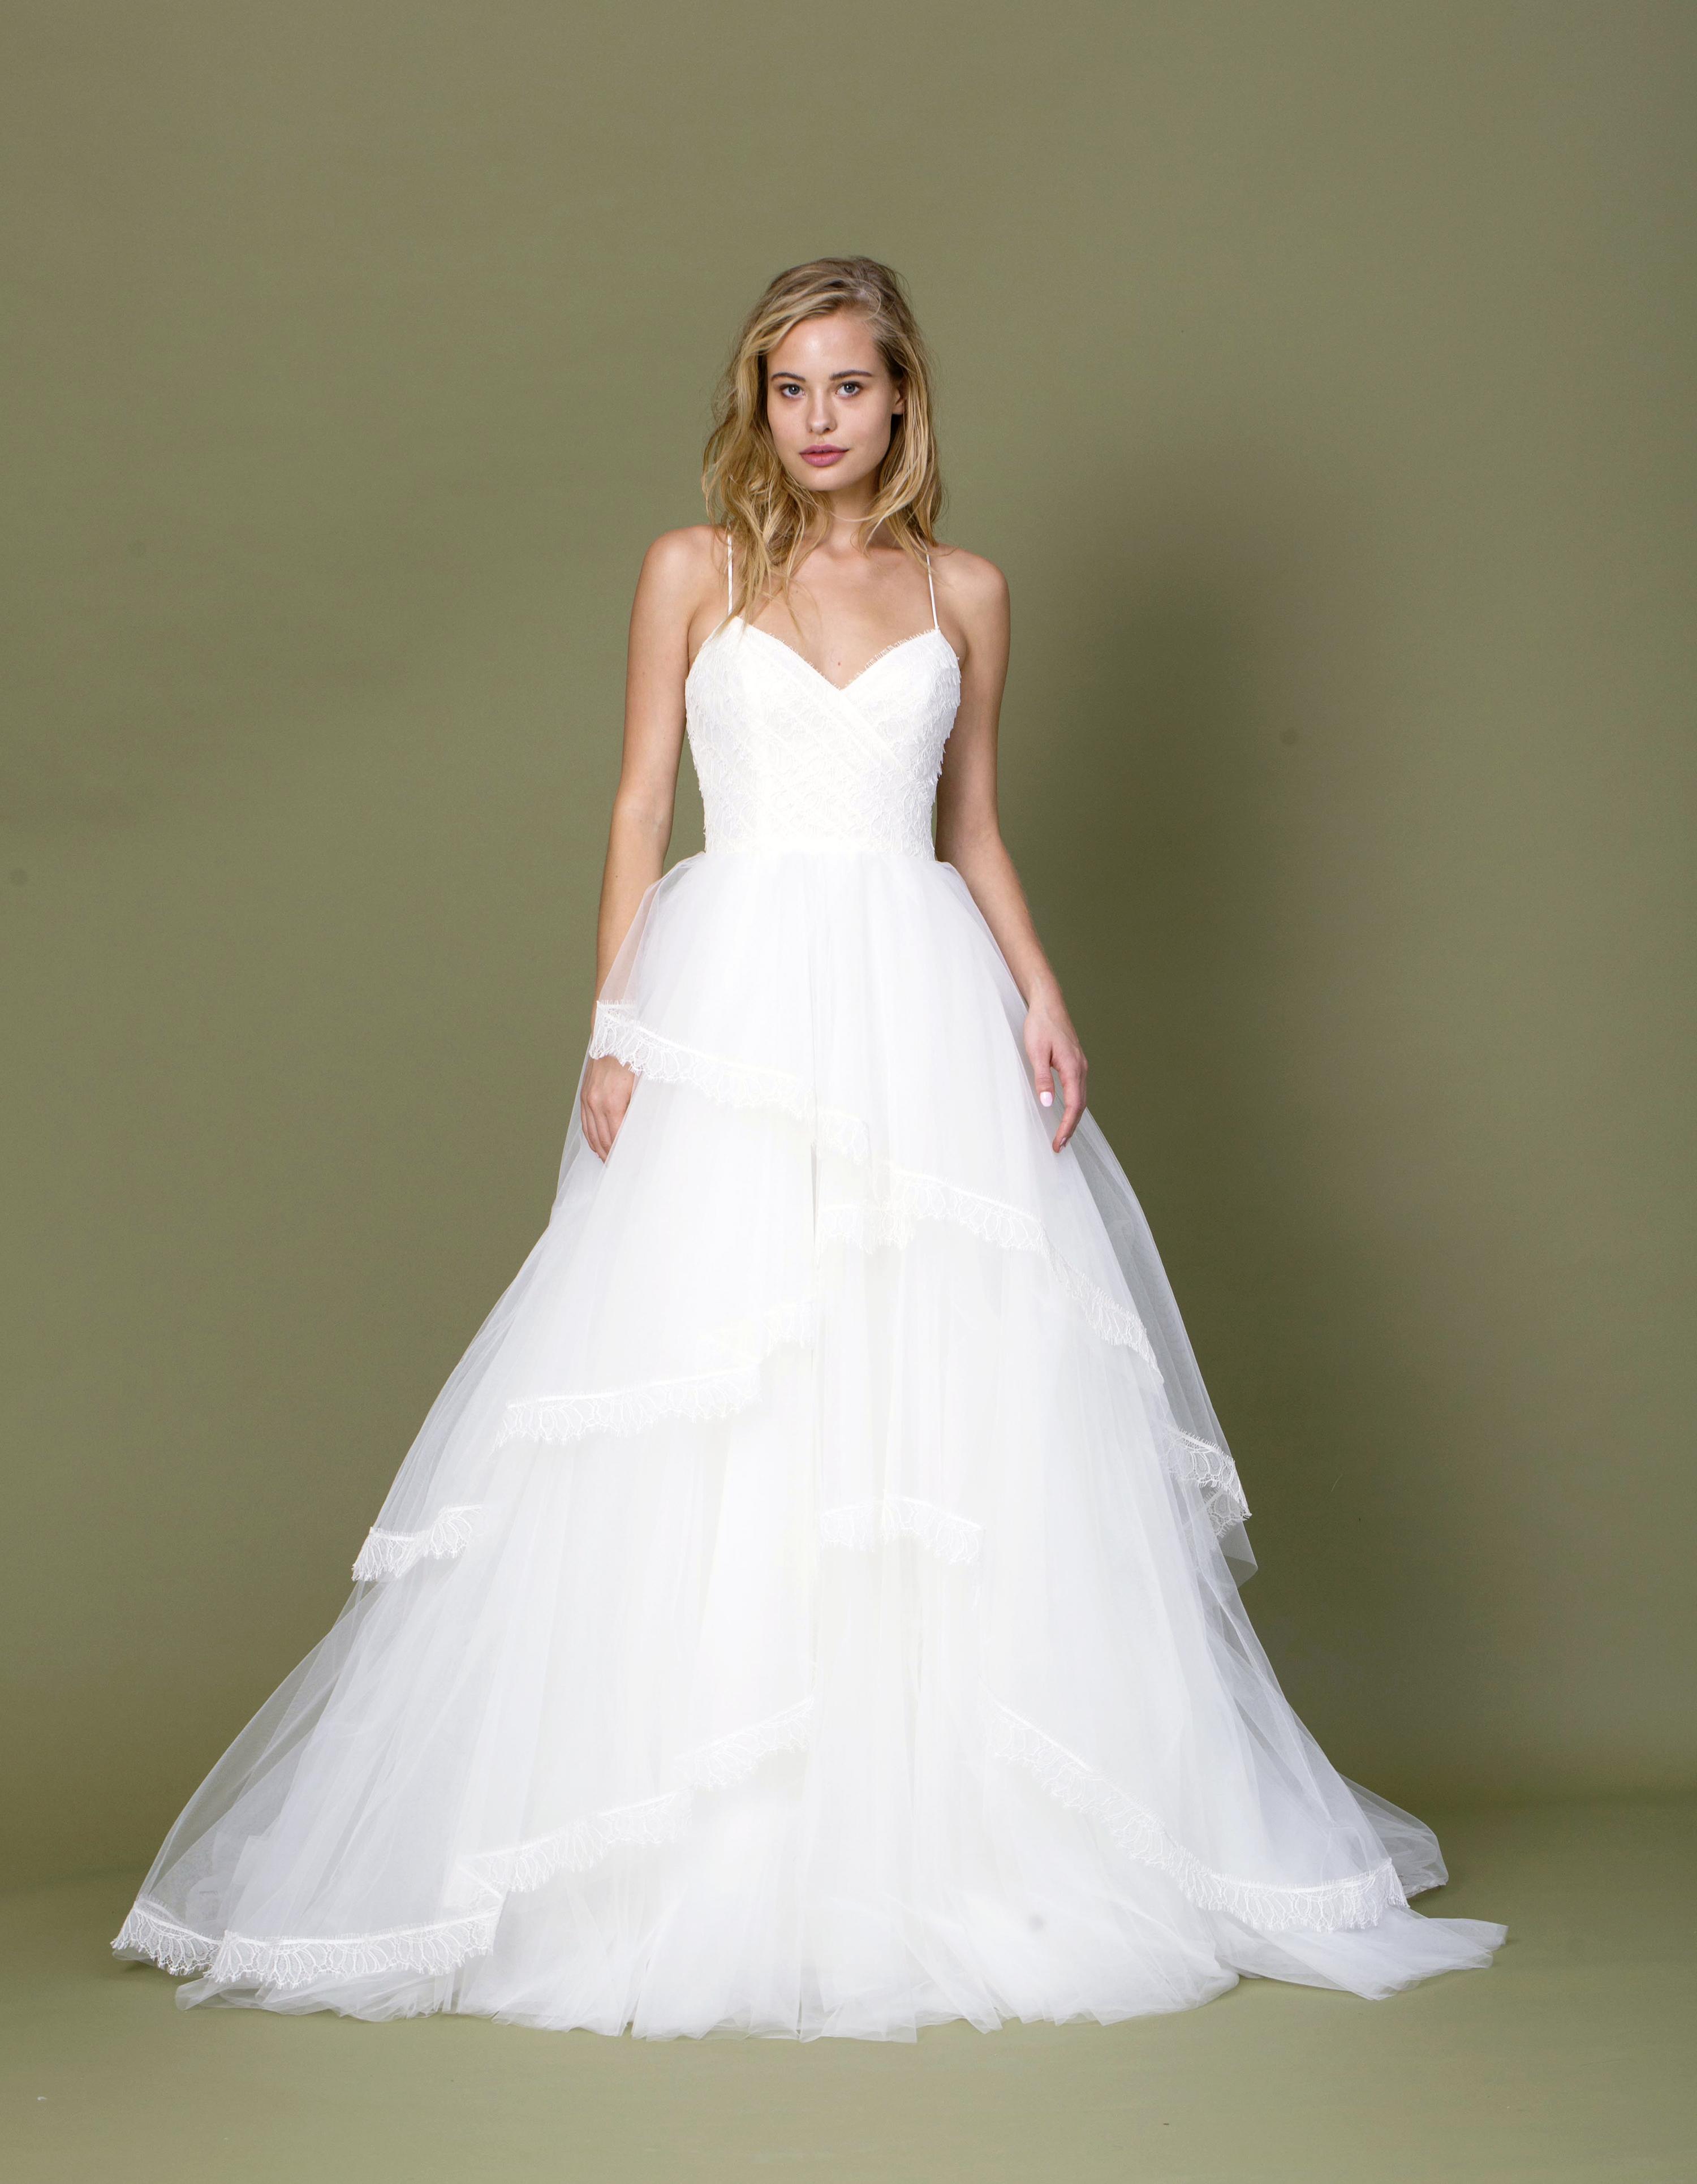 Amsale Christos Fall 2017 Wedding Dress Collection